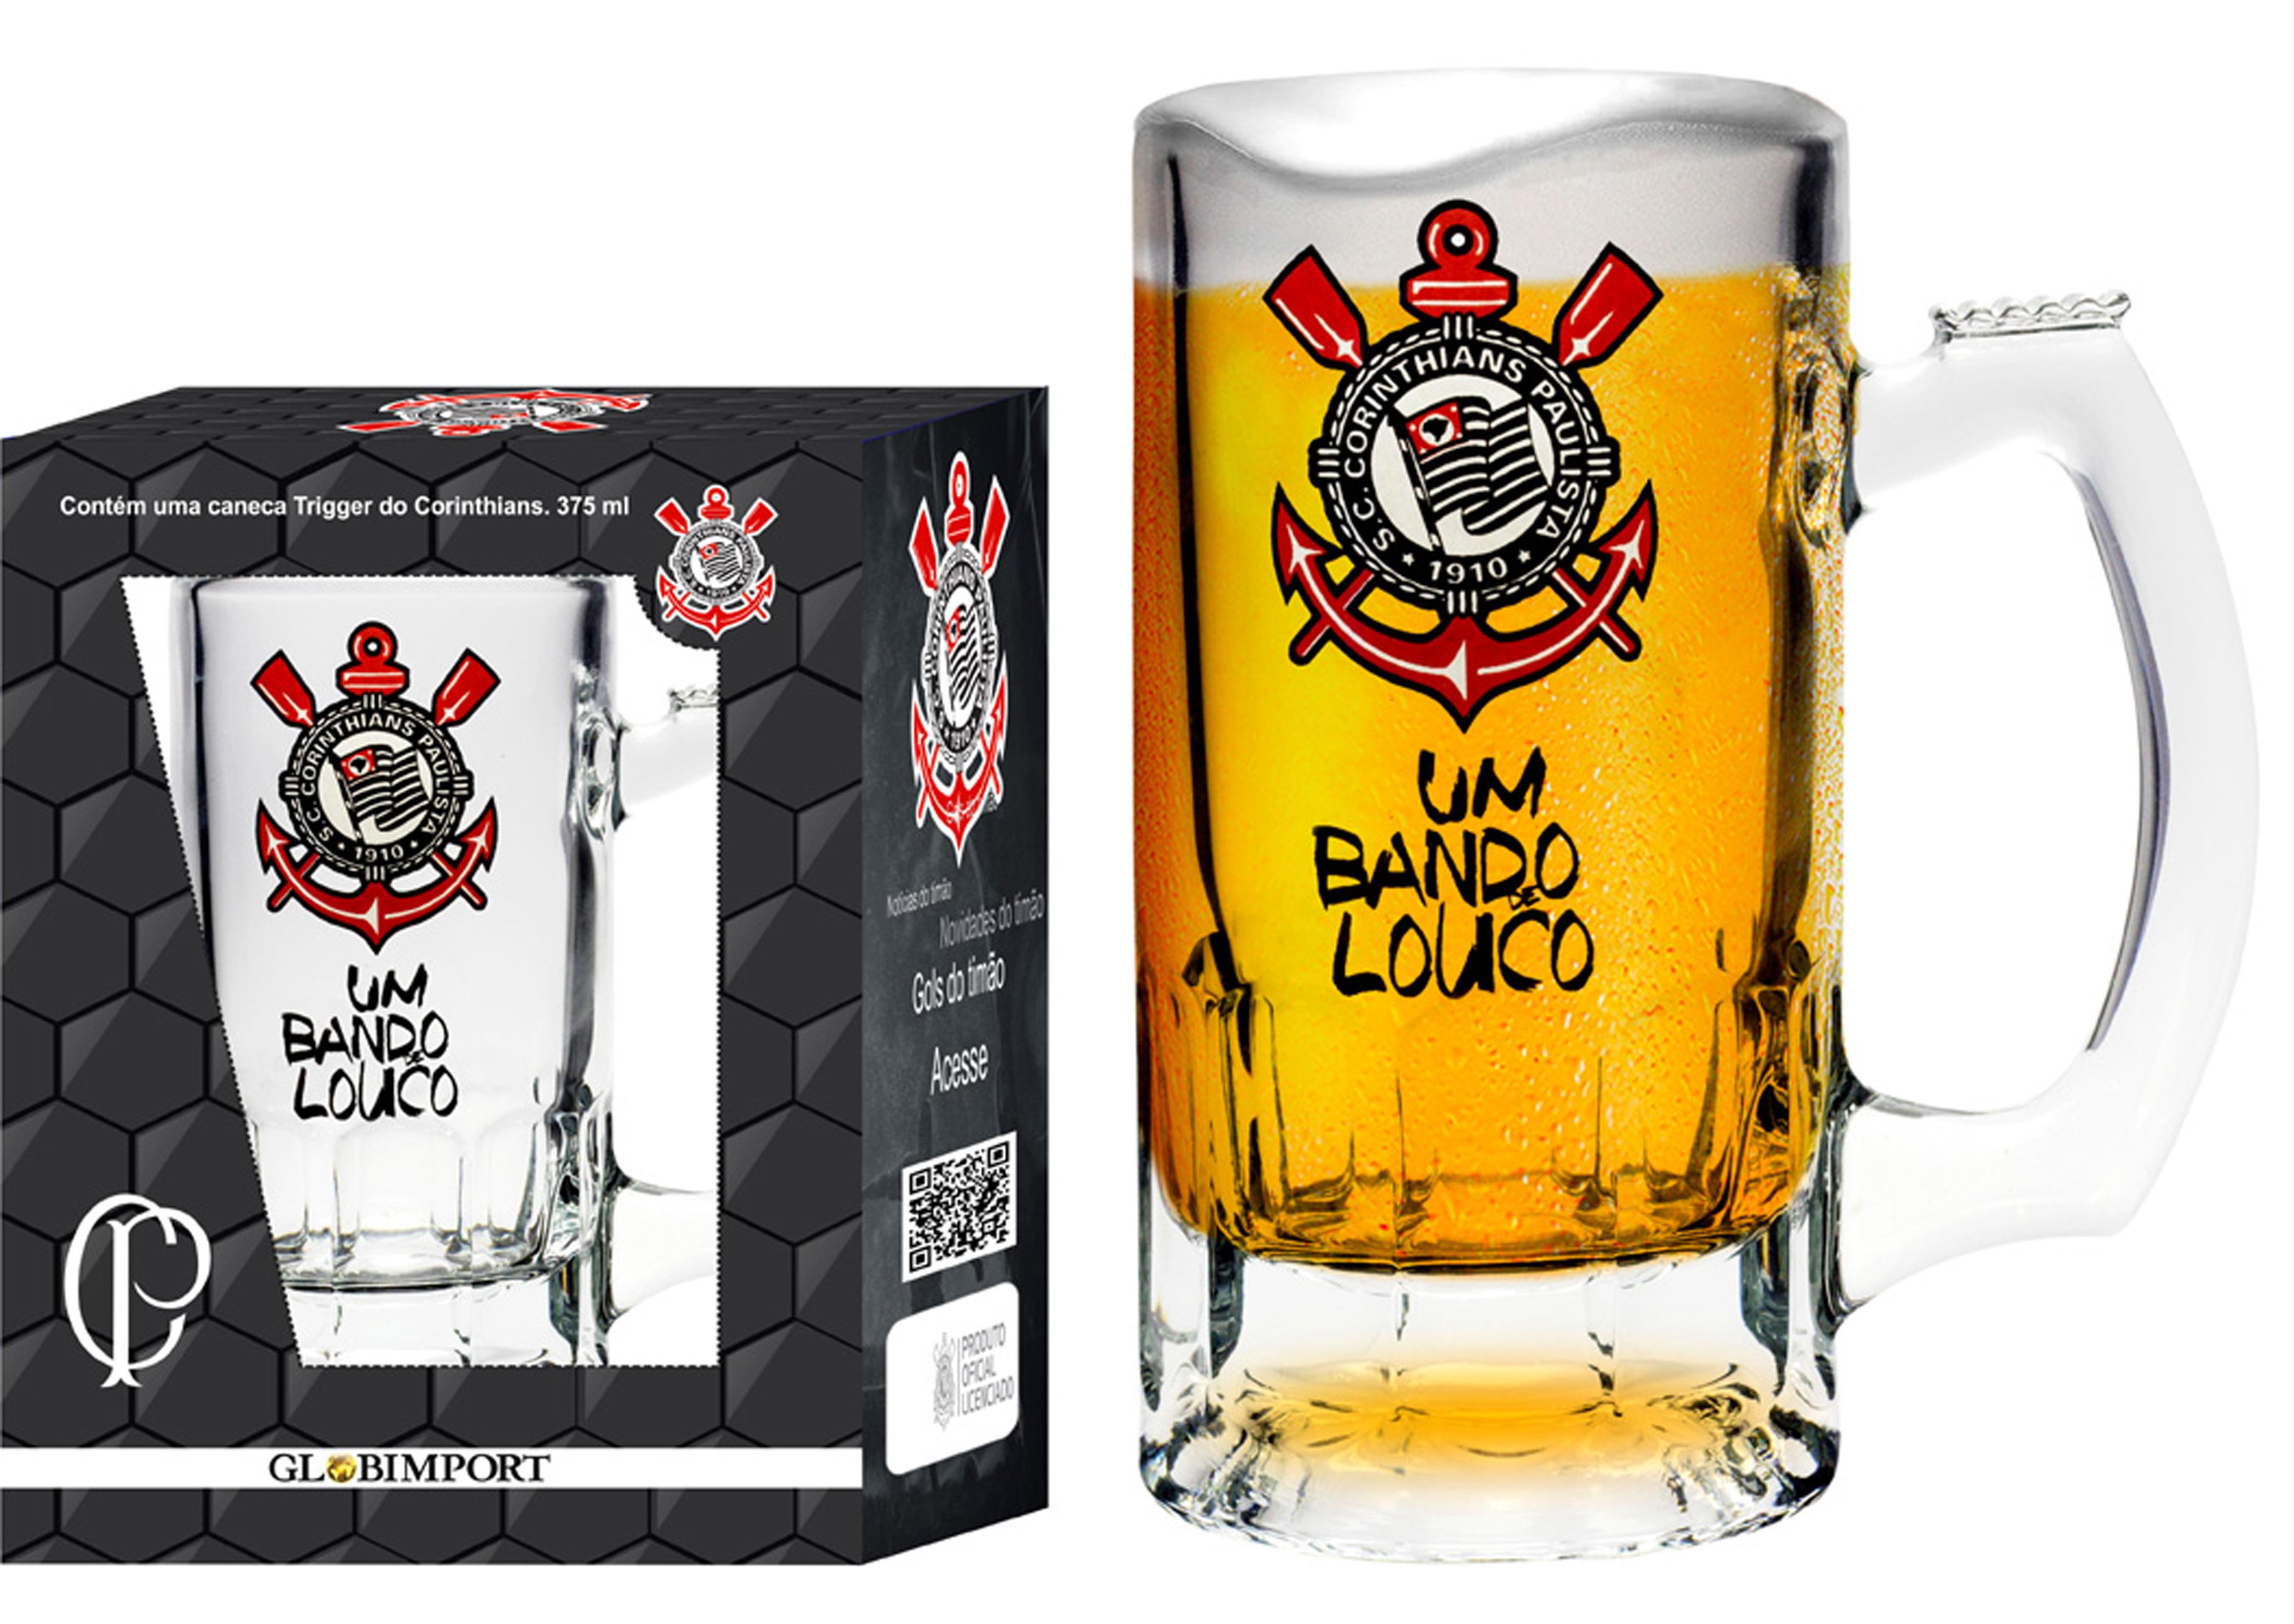 Caneca Trigger Corinthians Bando de Louco 375ml